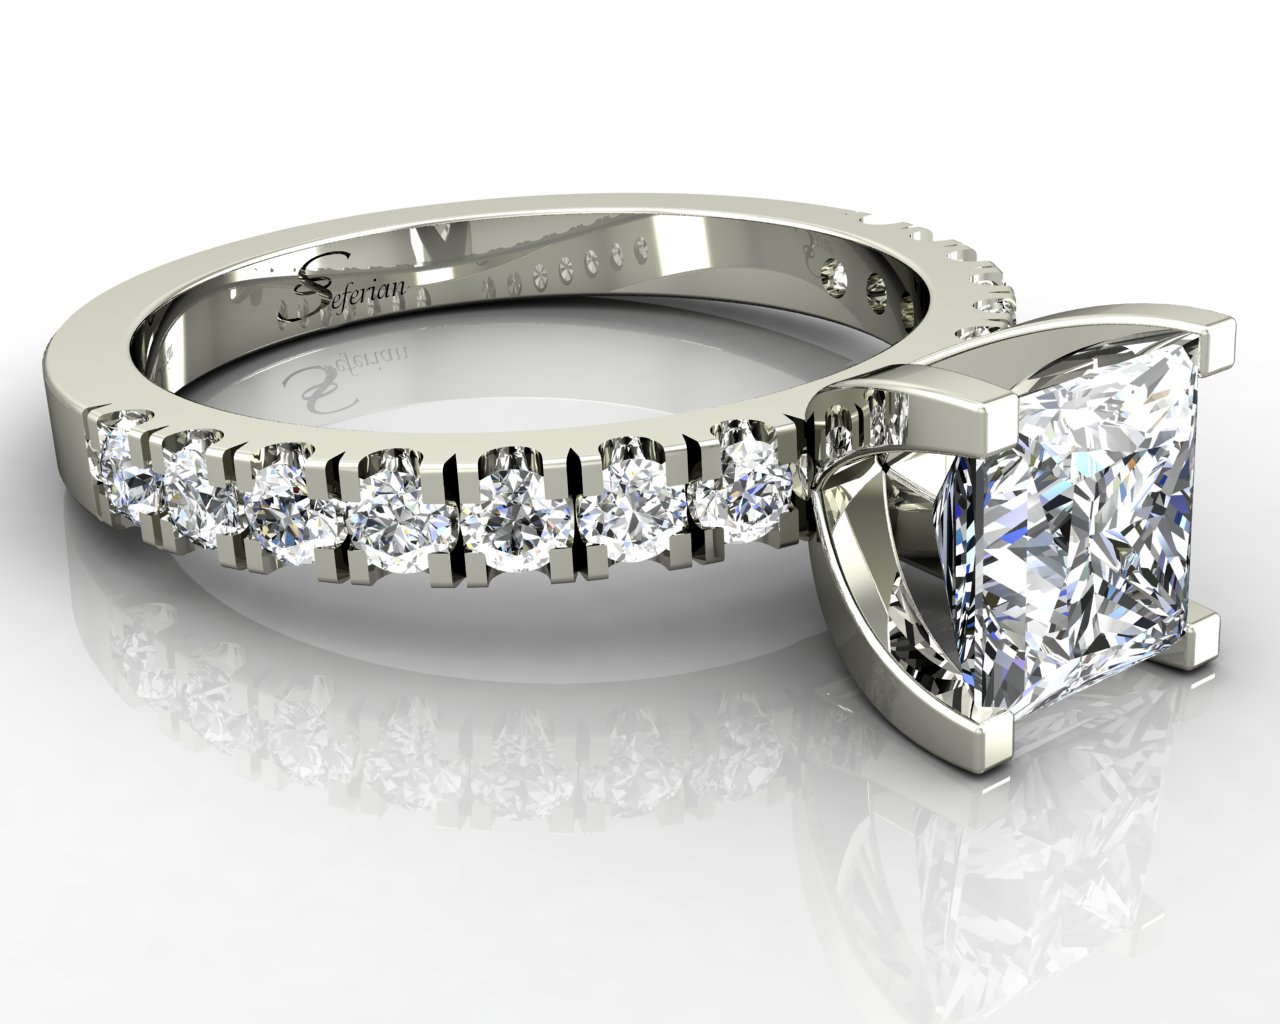 largest diamond ring - photo #4